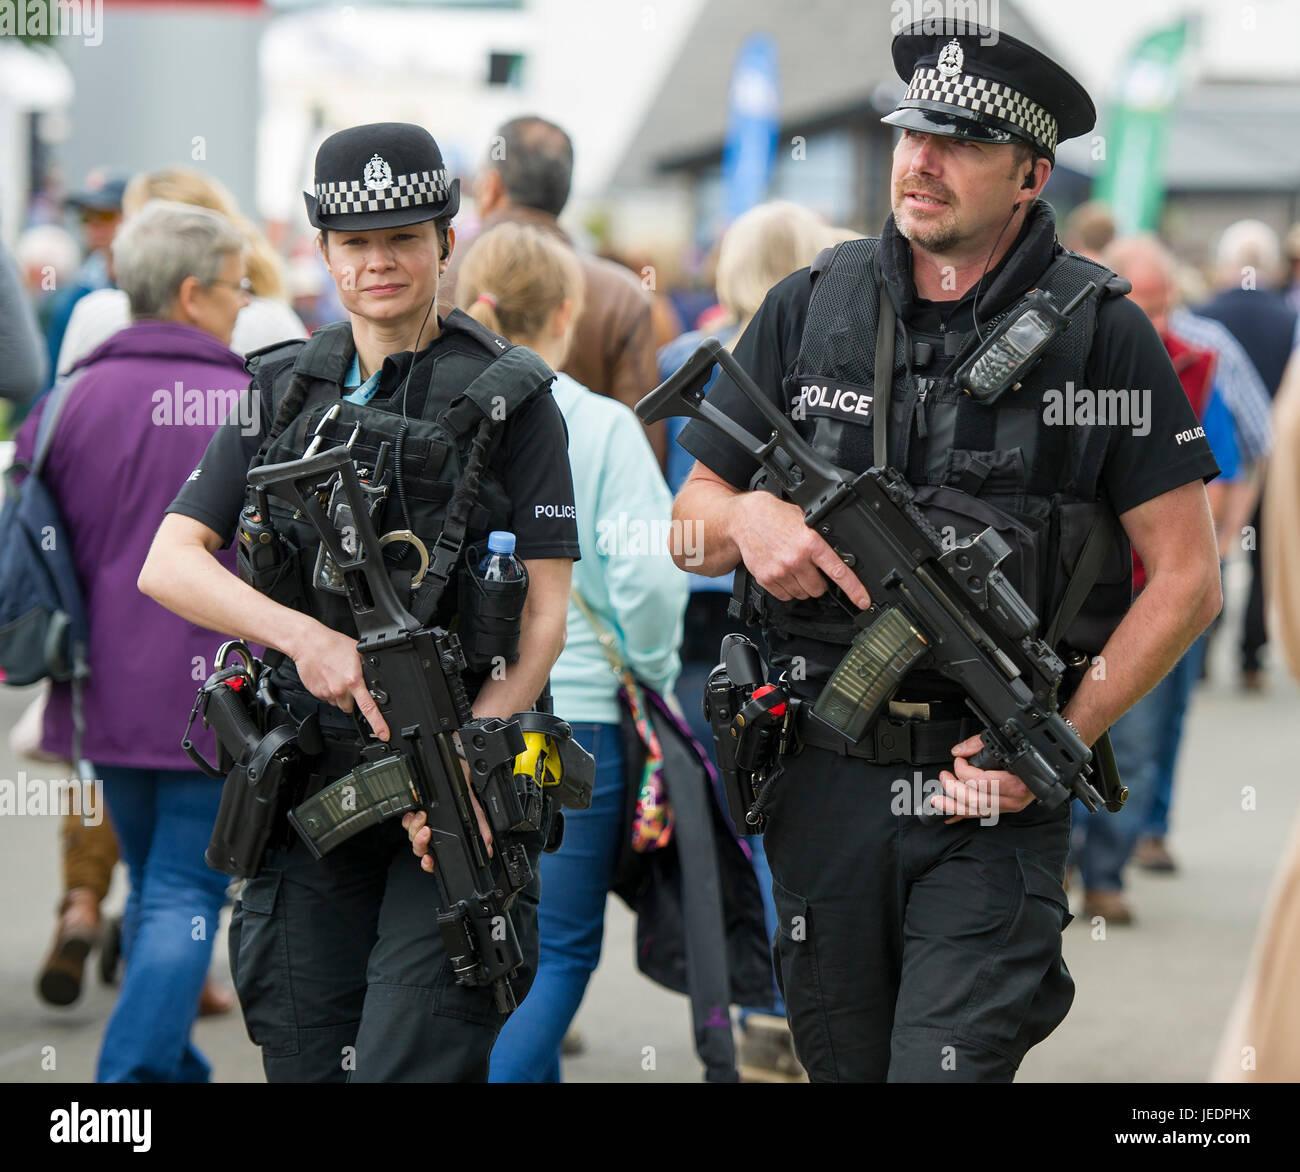 Event Security Edinburgh